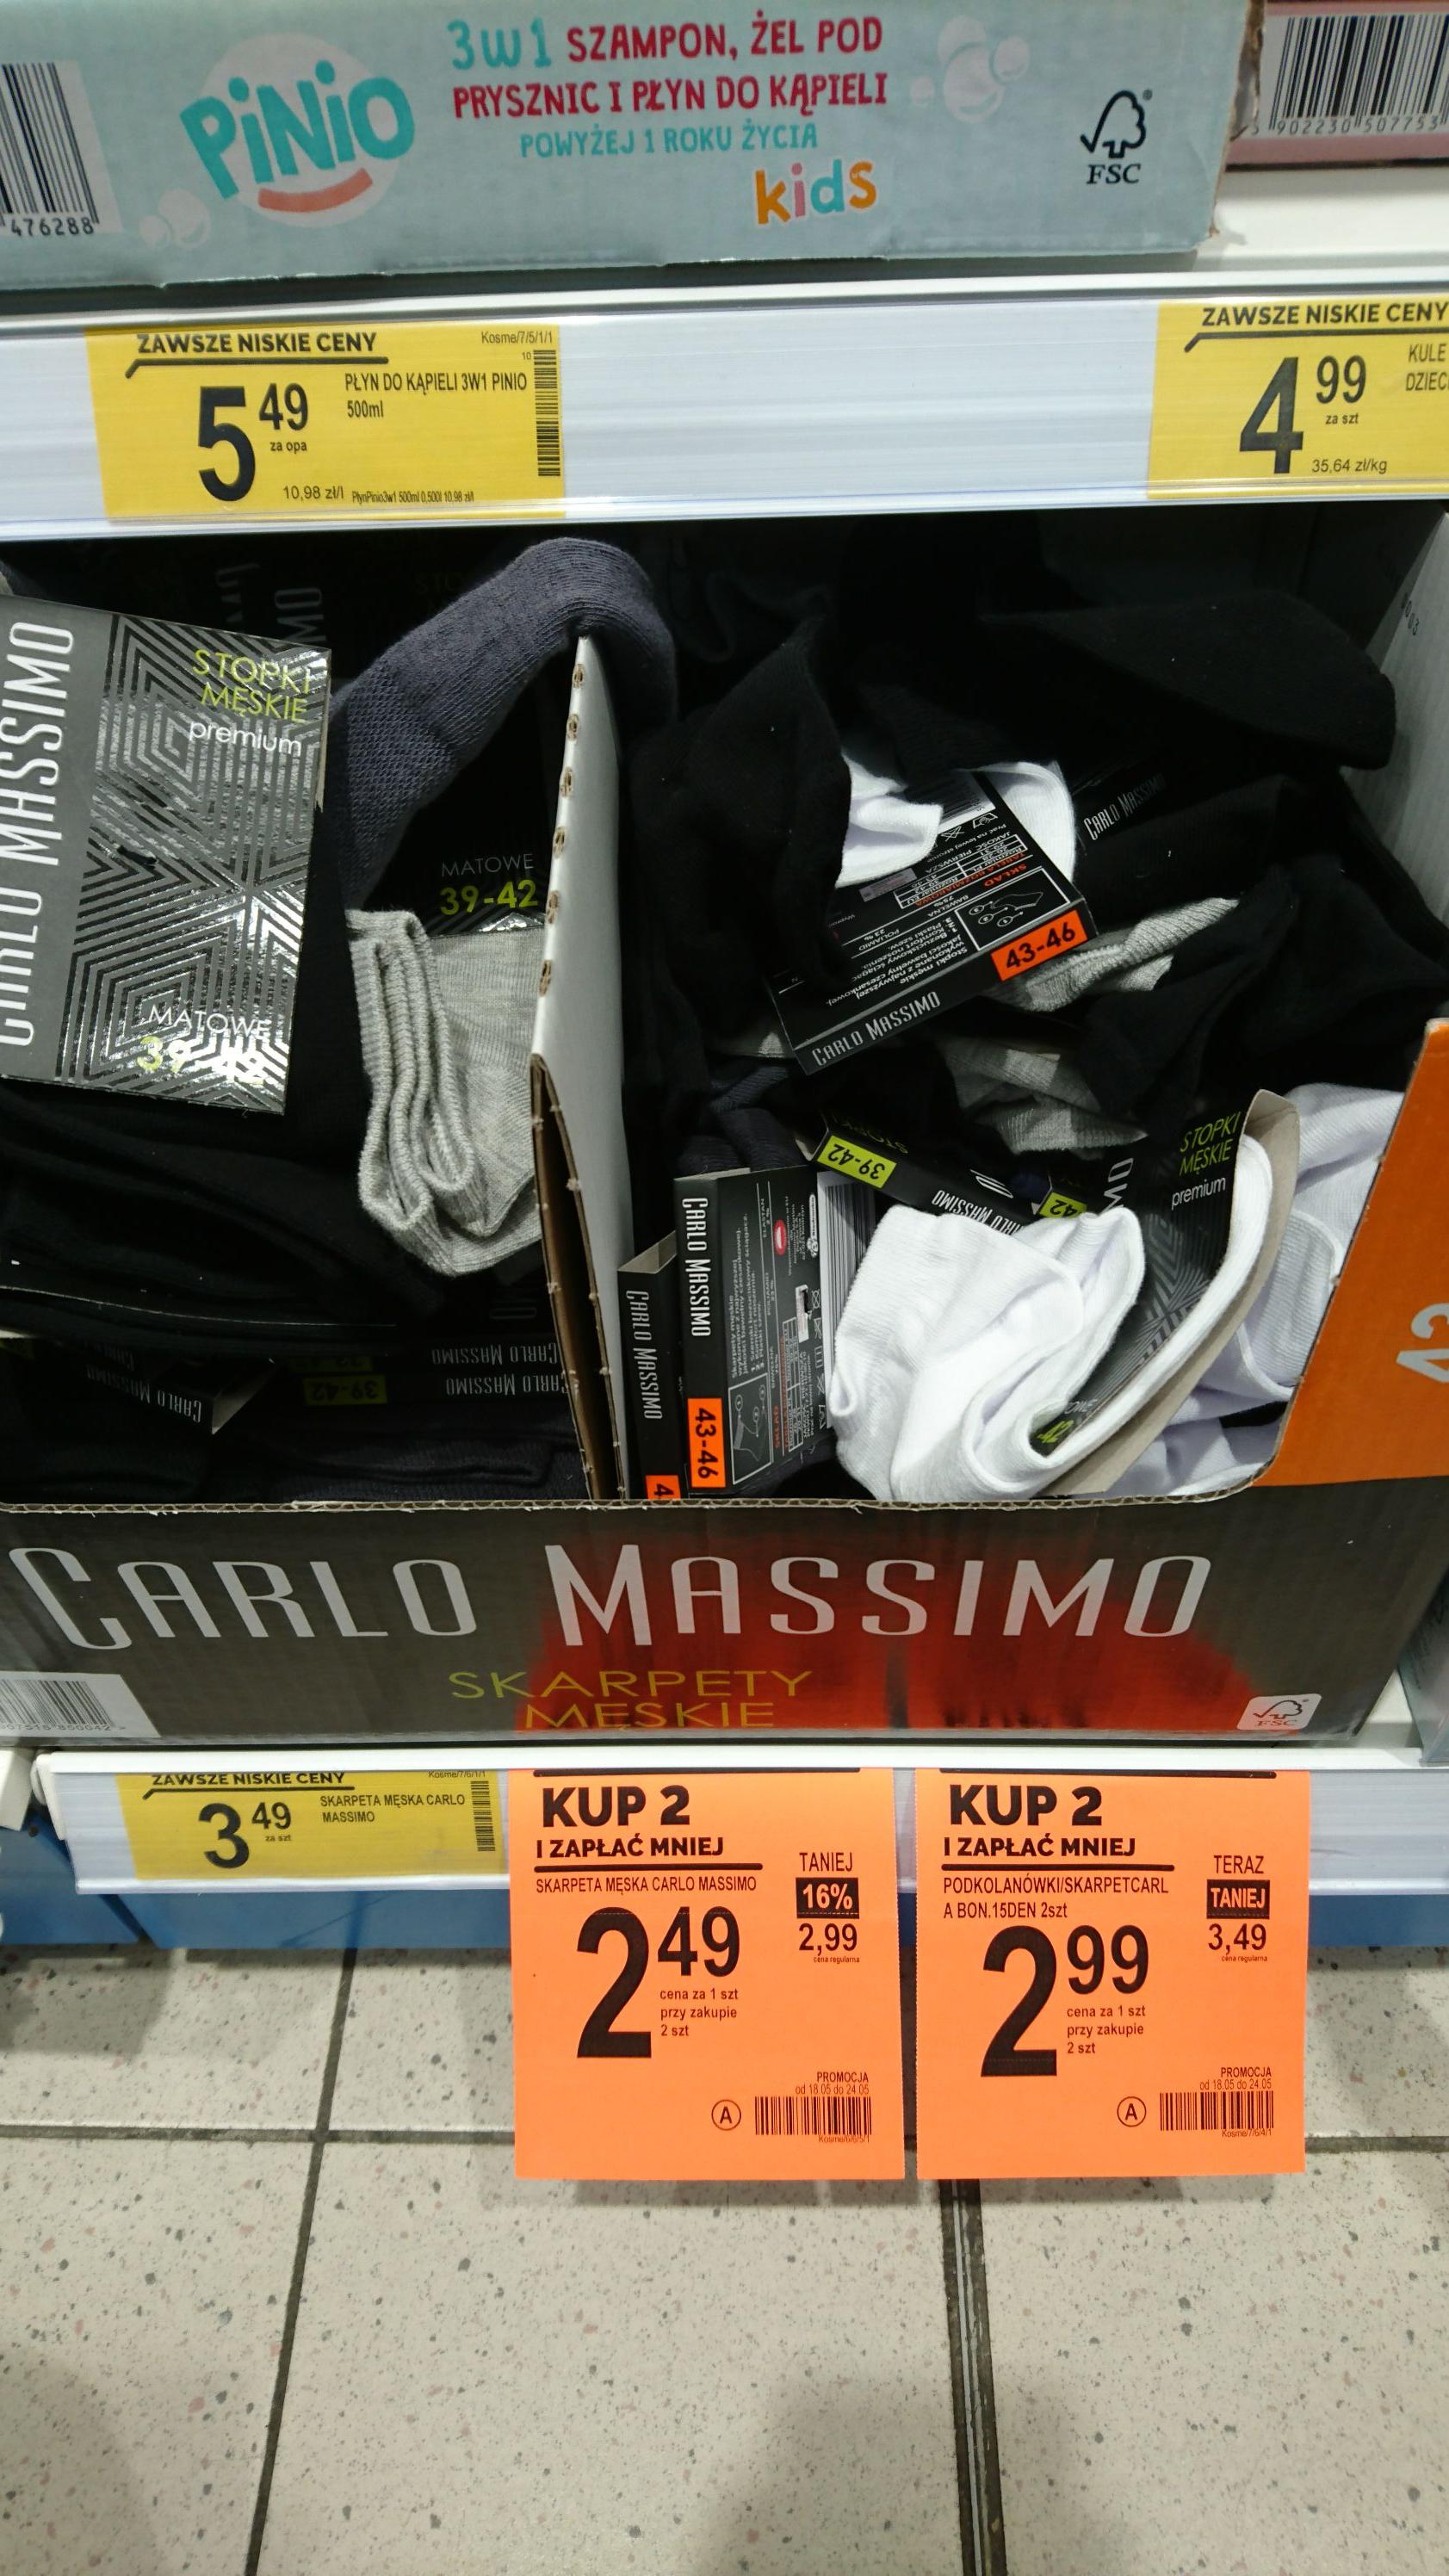 Biedronka stopki skarpeta męska Carlo Massimo kup 2 i zapłać mniej